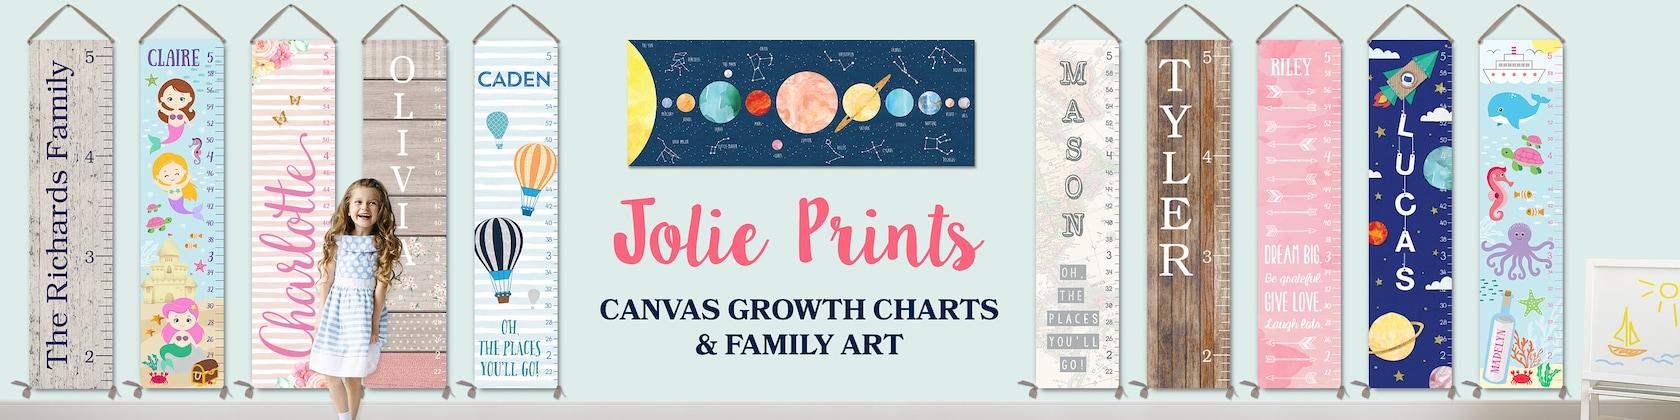 Growth Charts Personalized Kids Canvas Growth von JoliePrints